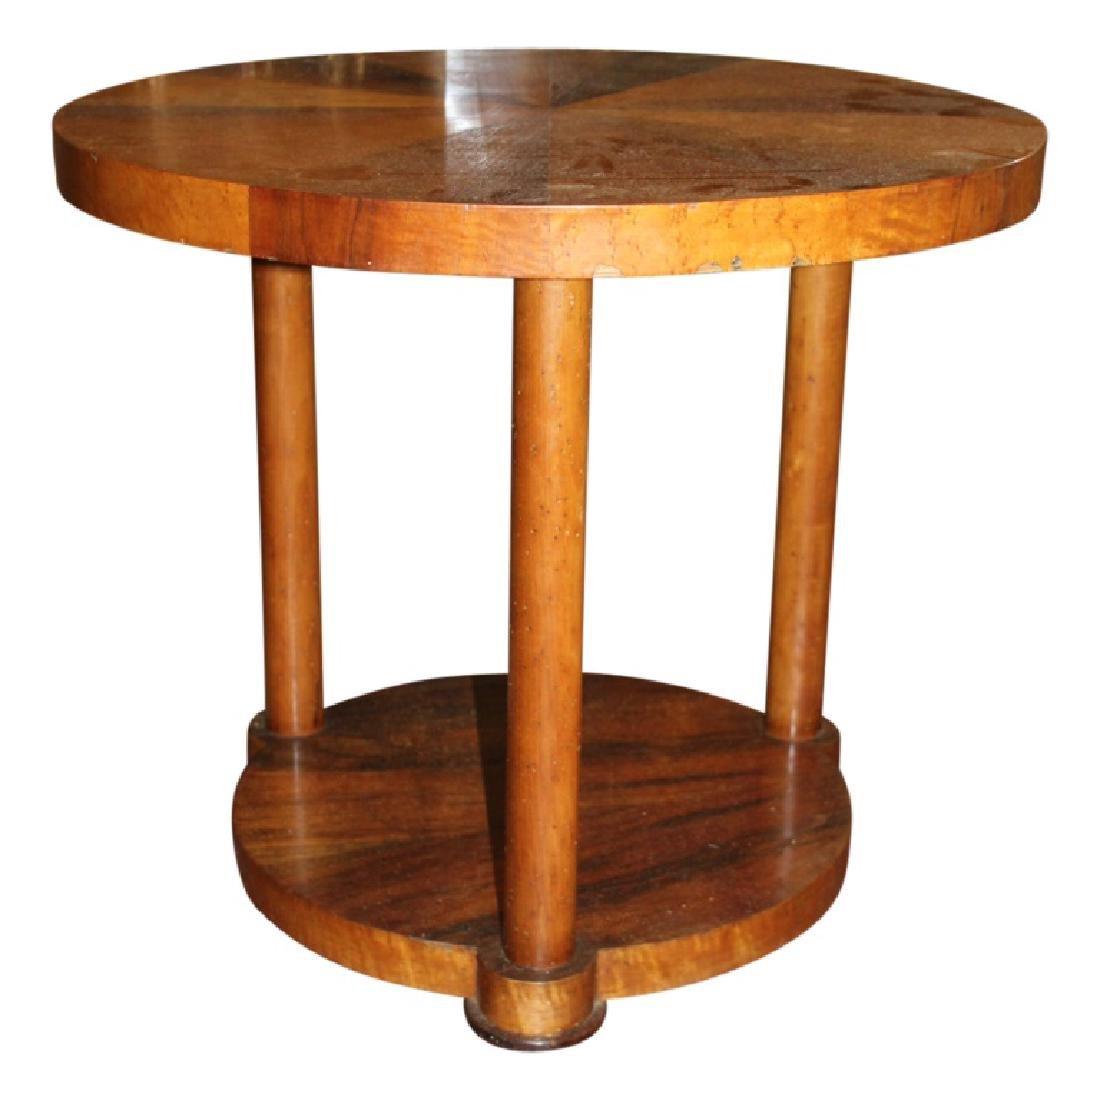 Modern Sunburst Biedermeier End Table